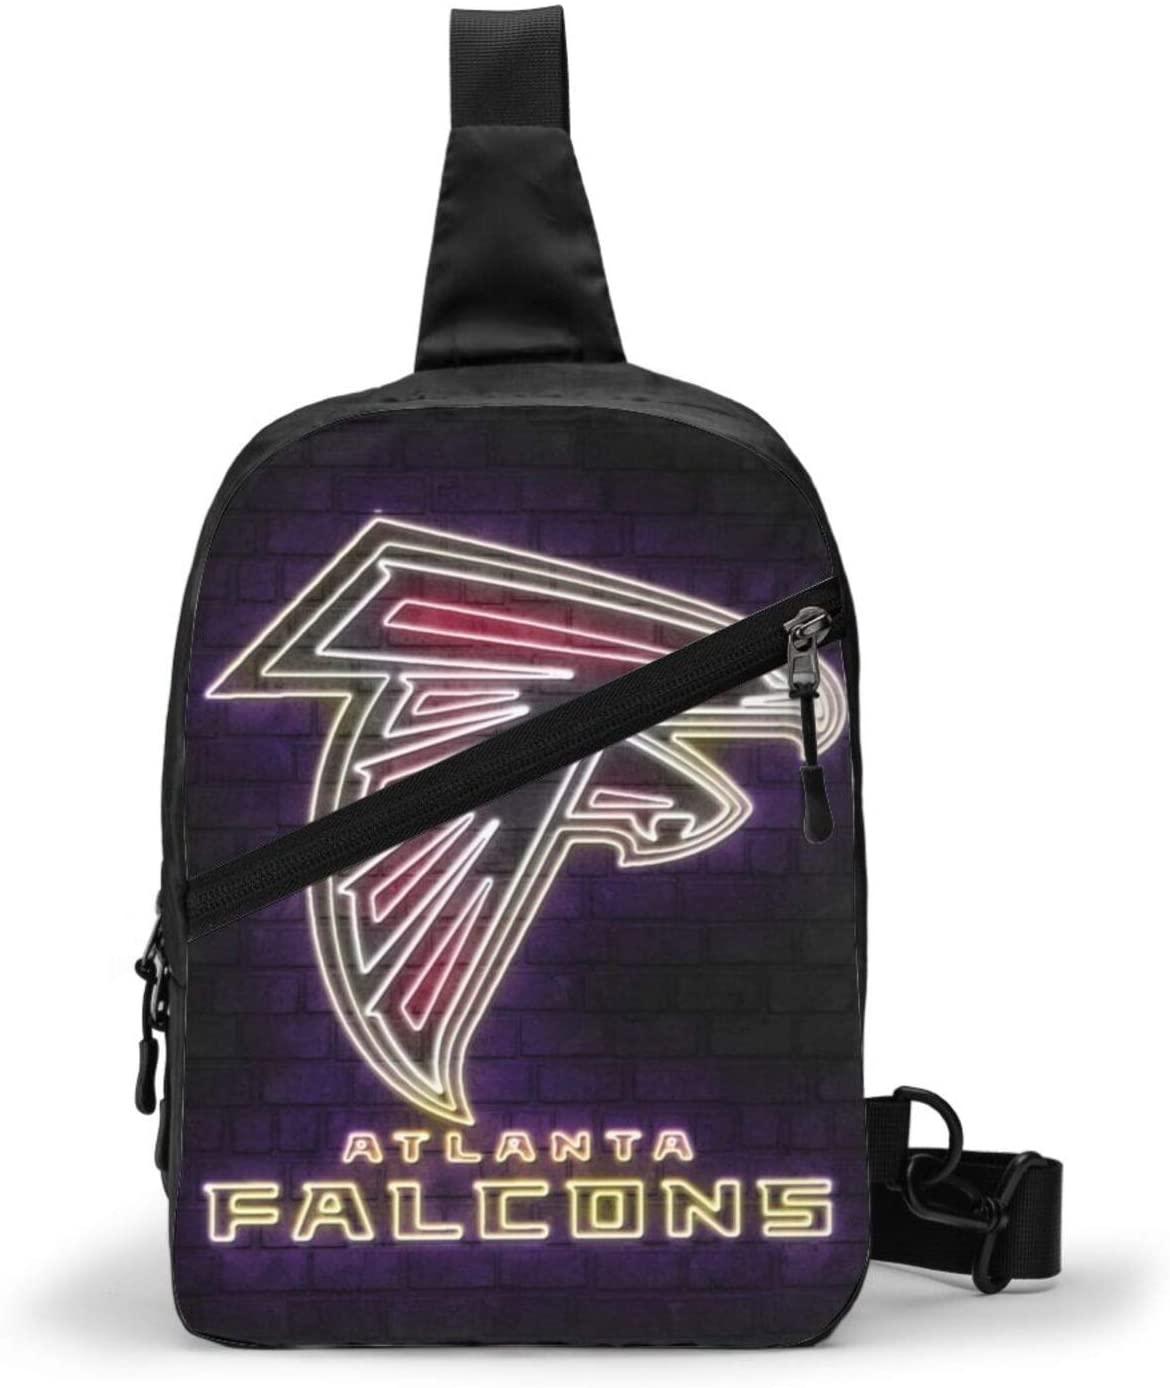 FDLB Atlanta Football Falcon Chest Package Sling Bag Large Capacity Multipurpose Daypack Men Women Chest Shoulder Backpack Casual Crossbody